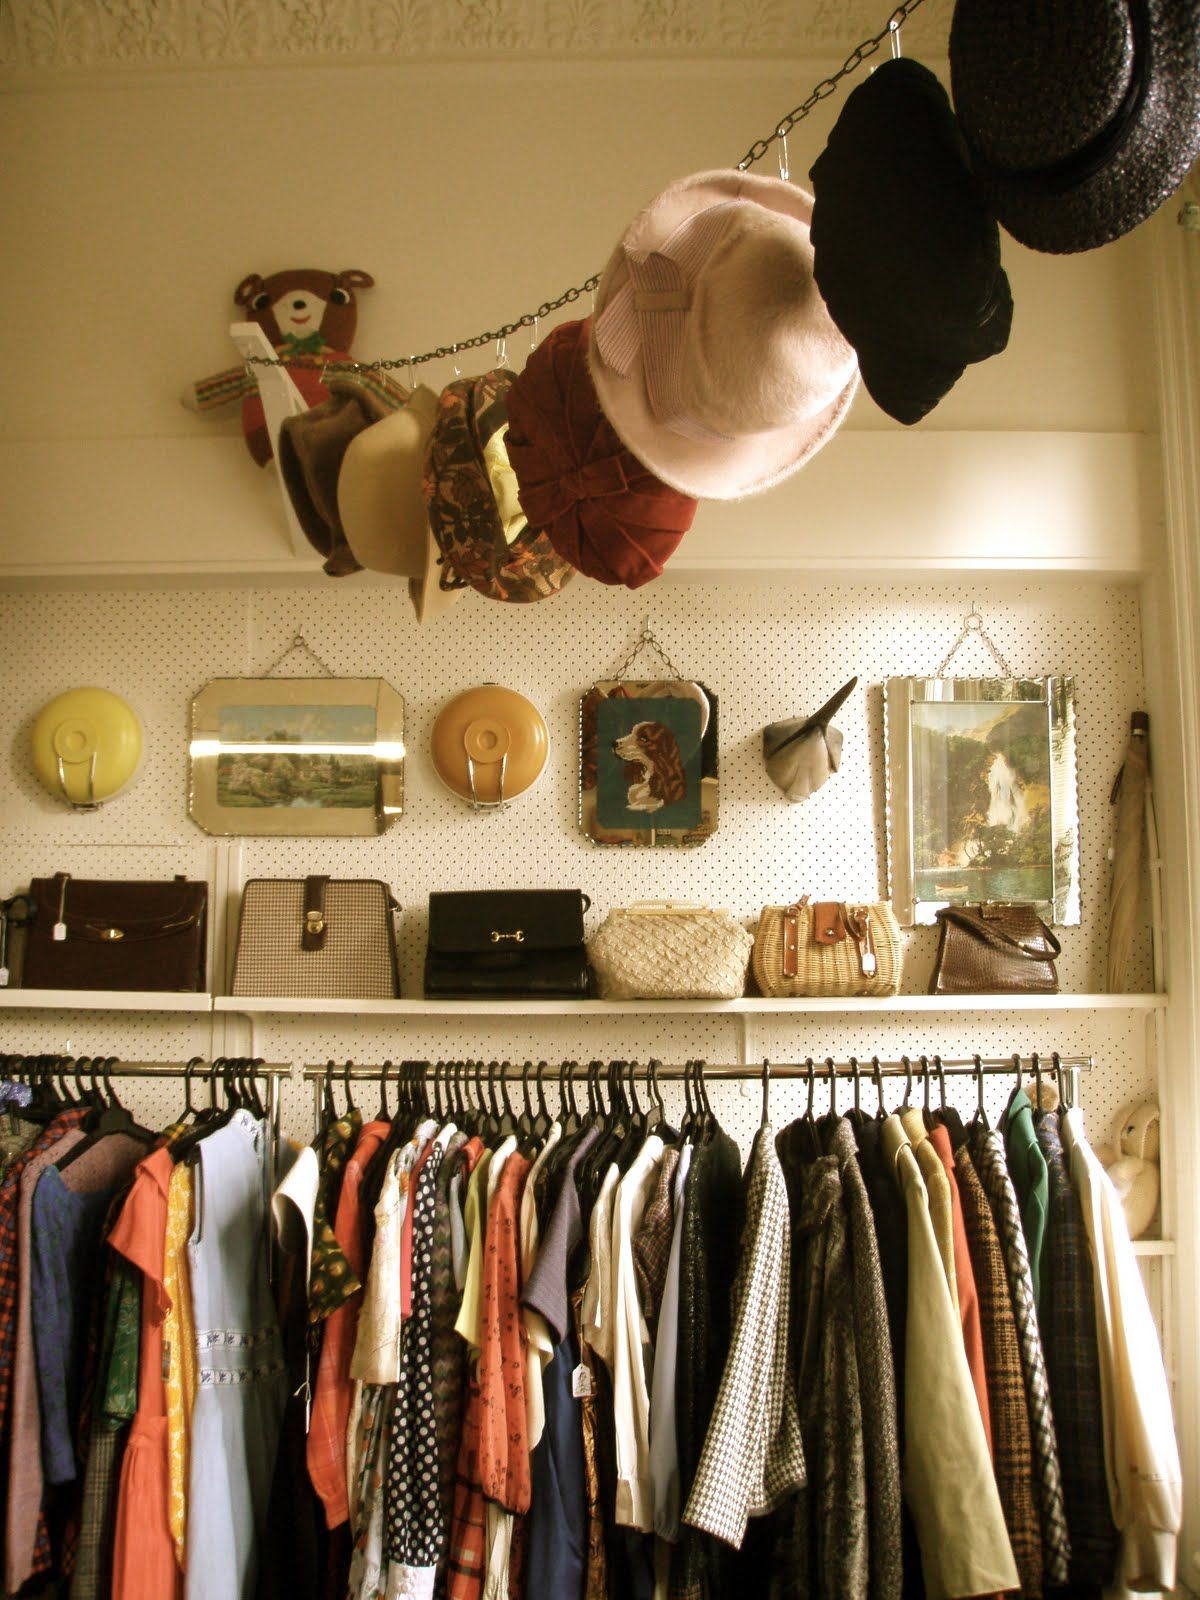 Gail Carriger Diy Hat Rack Hanging Hats Home Storage Organization